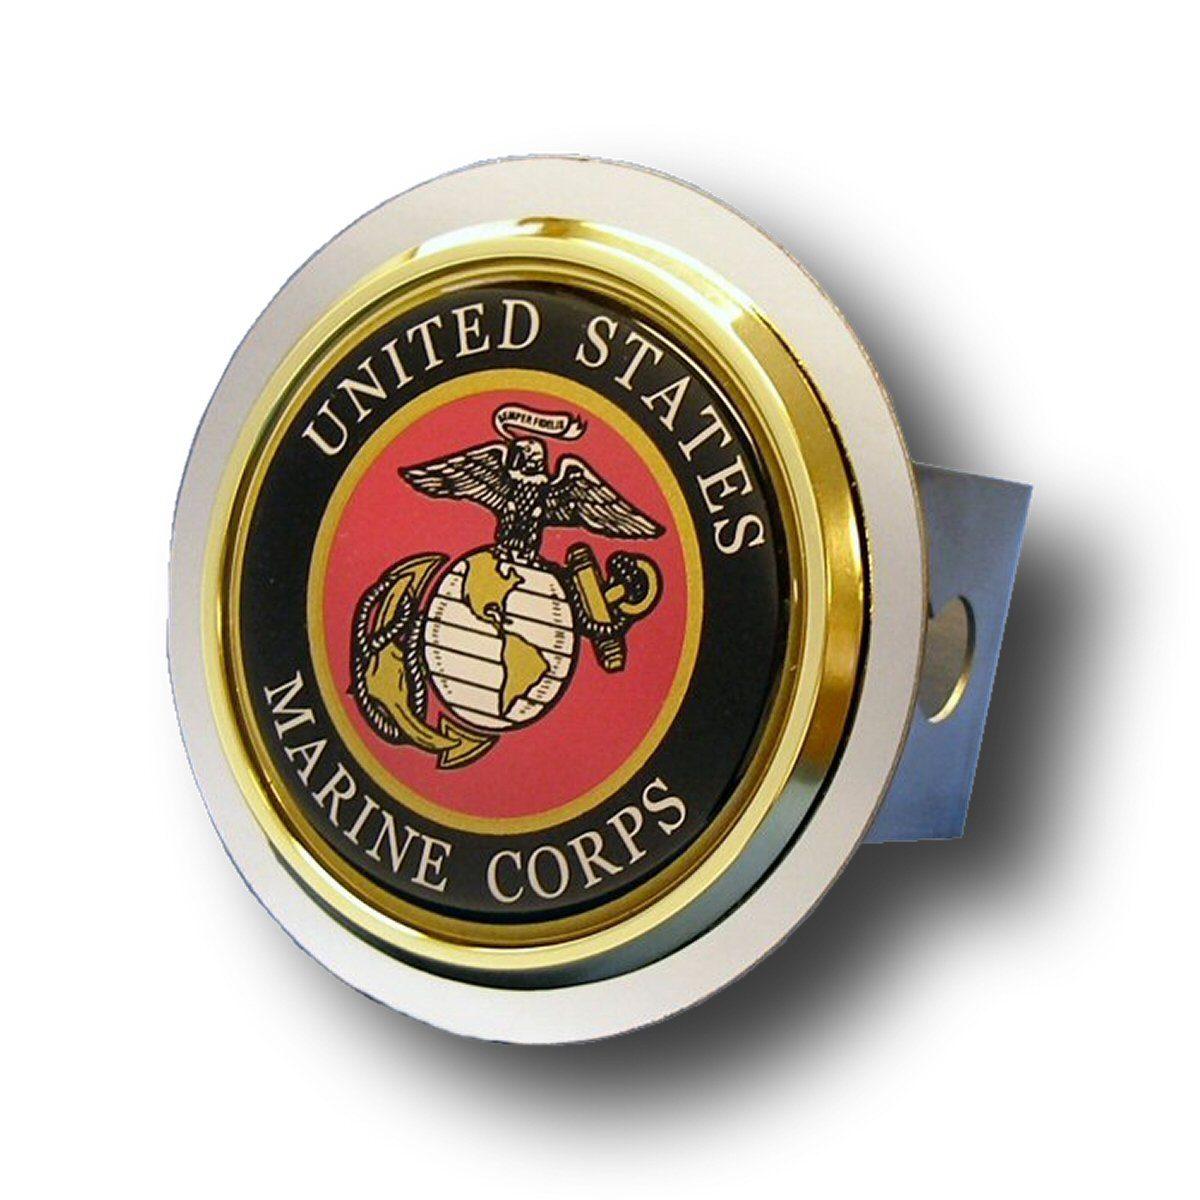 Patriotic US Marine Corps Chrome Trailer Hitch Plug by Patriotic